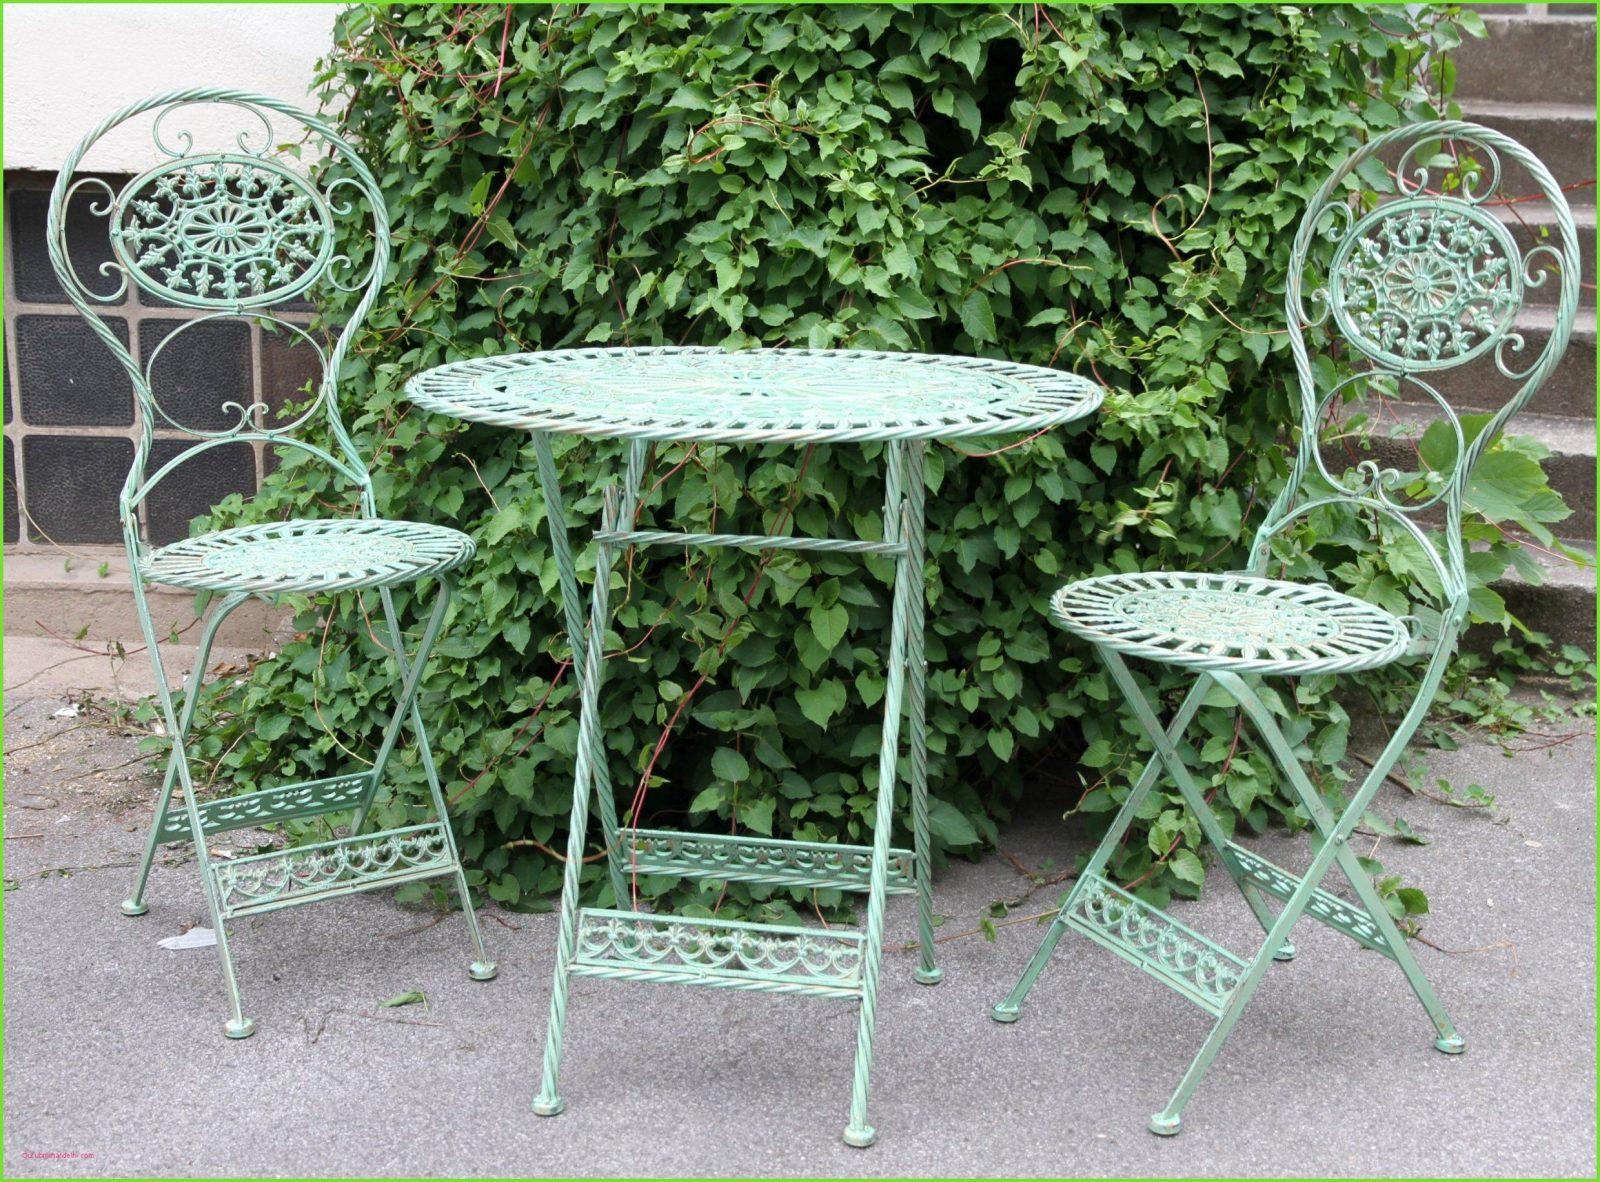 Gartenmobel Metall Antik Fantastisch 38 Gartenmöbel Eisen Antik von Gartenmöbel Aus Metall Antik Bild